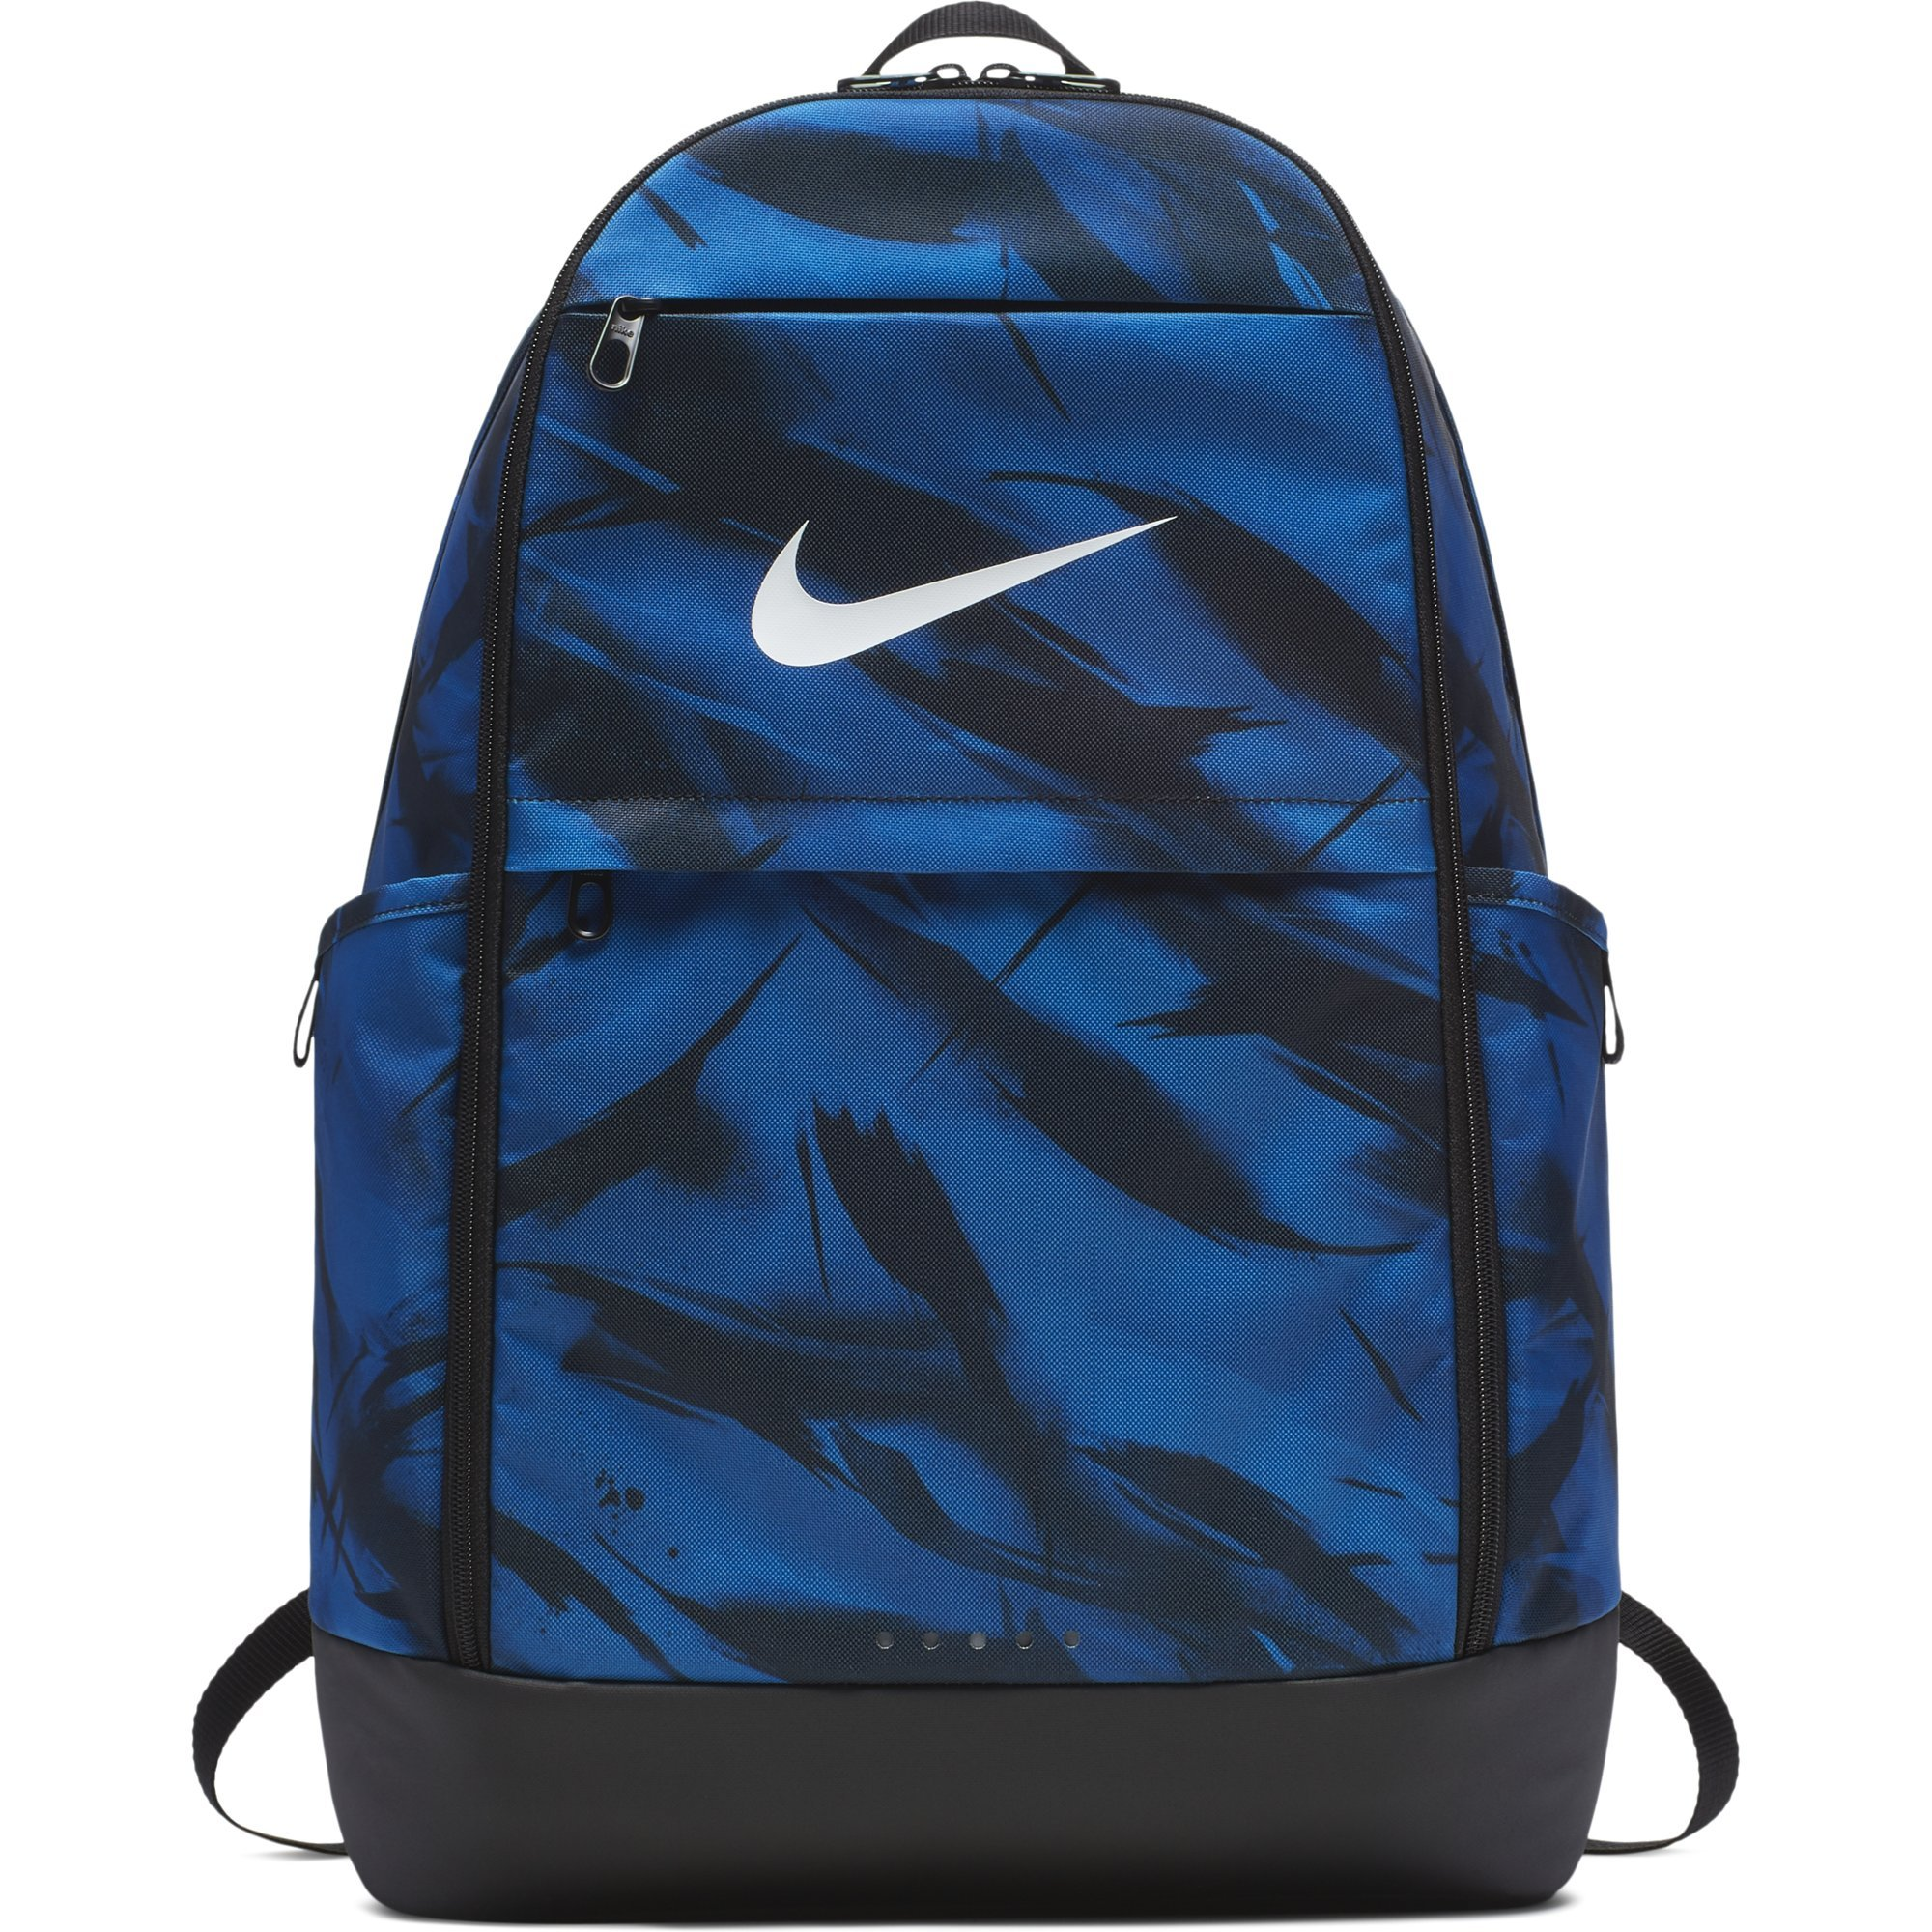 NIKE Brasilia All Over Print Backpack, Gym Blue/Black/White, X-Large